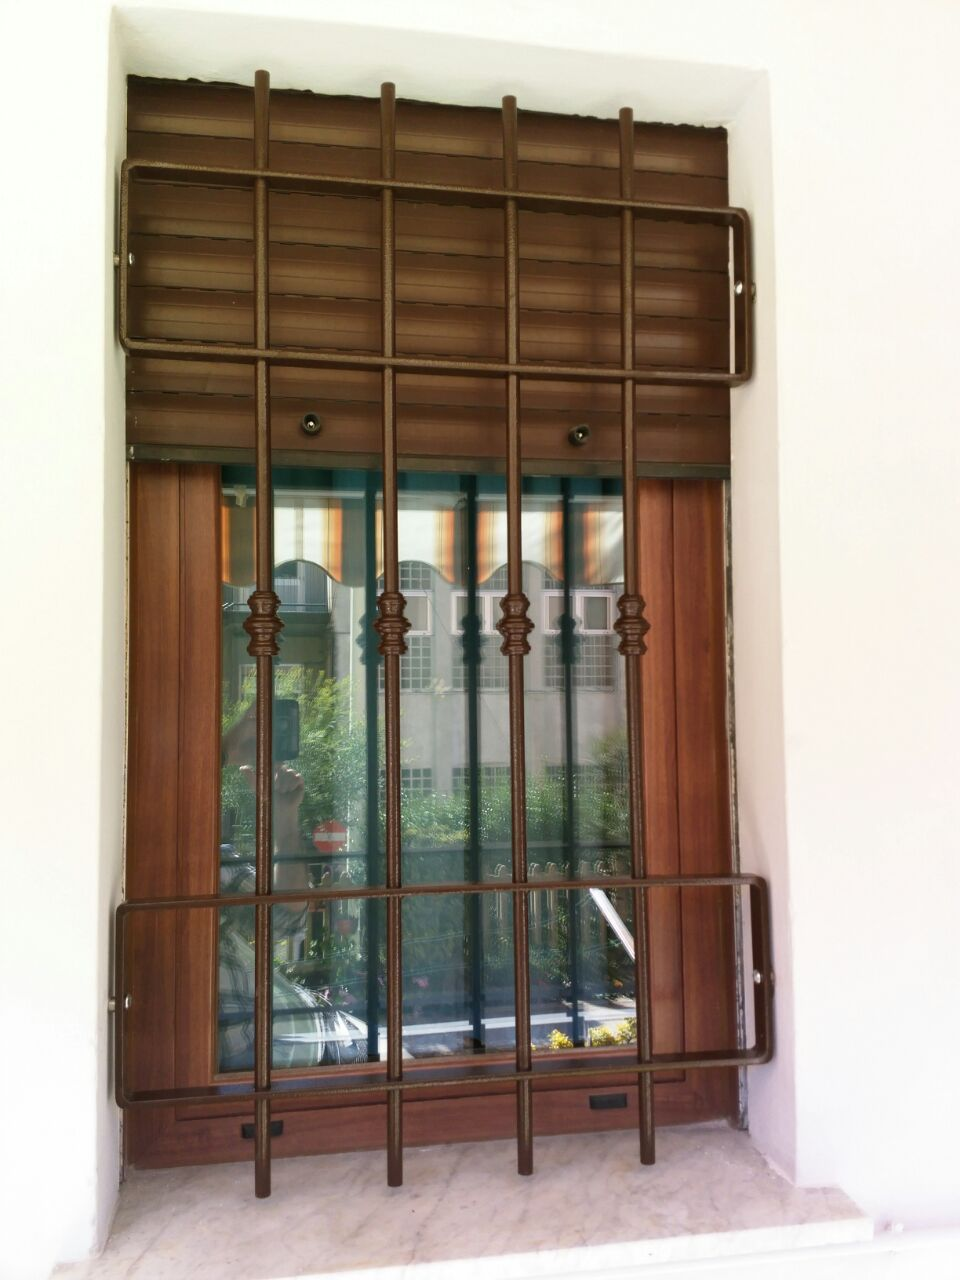 Inferriate di sicurezza per porte finestre e portefinestre al minor prezzo inferriate di - Inferriate mobili per finestre ...